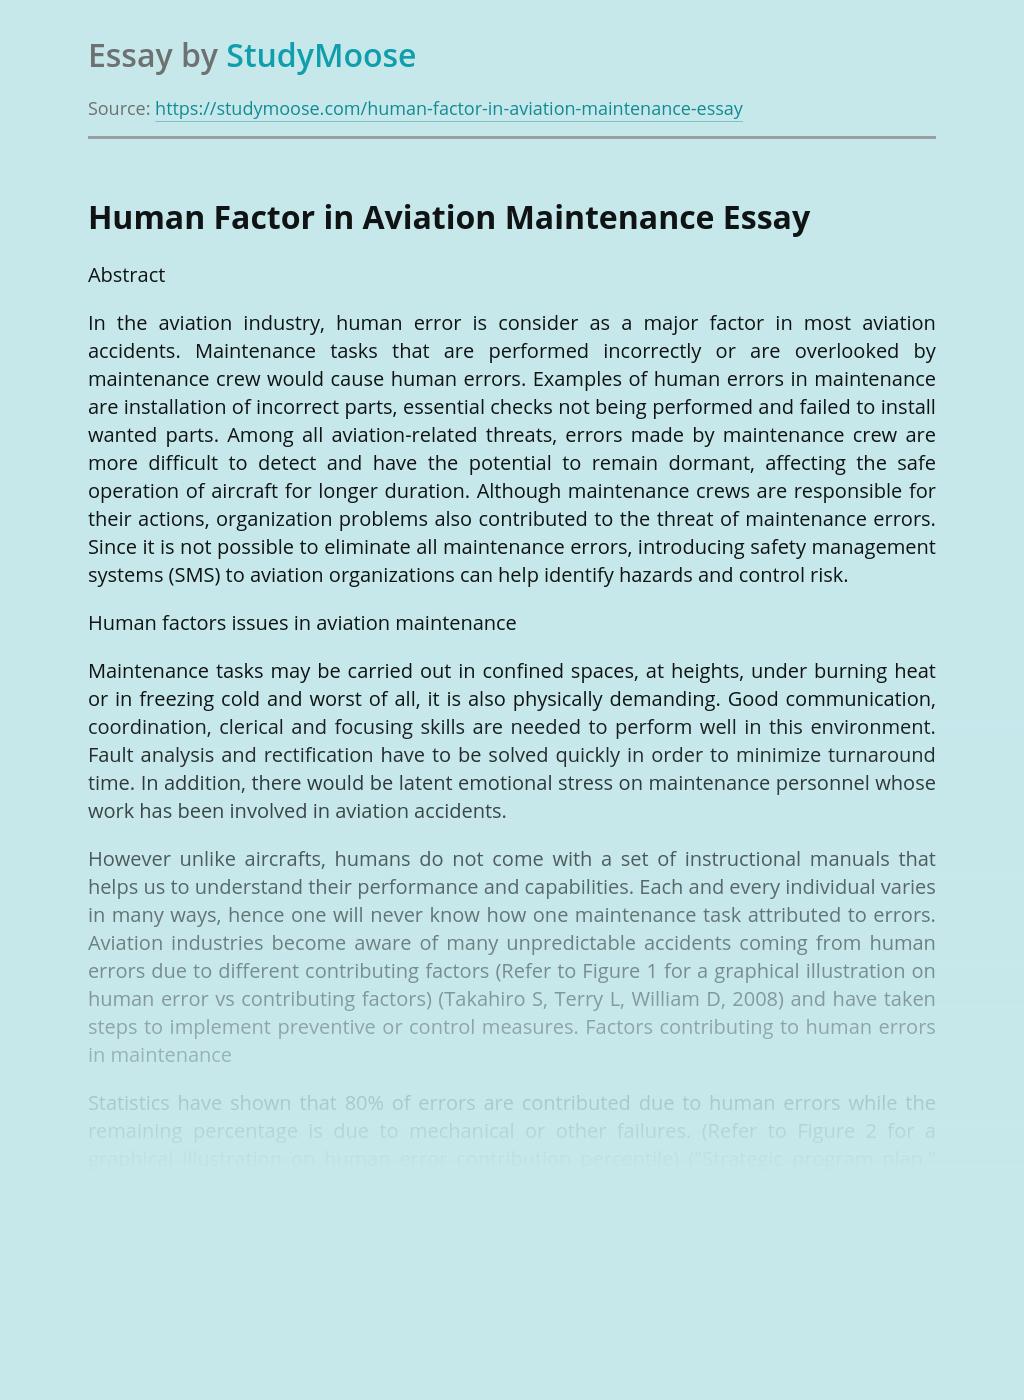 Human Factor in Aviation Maintenance